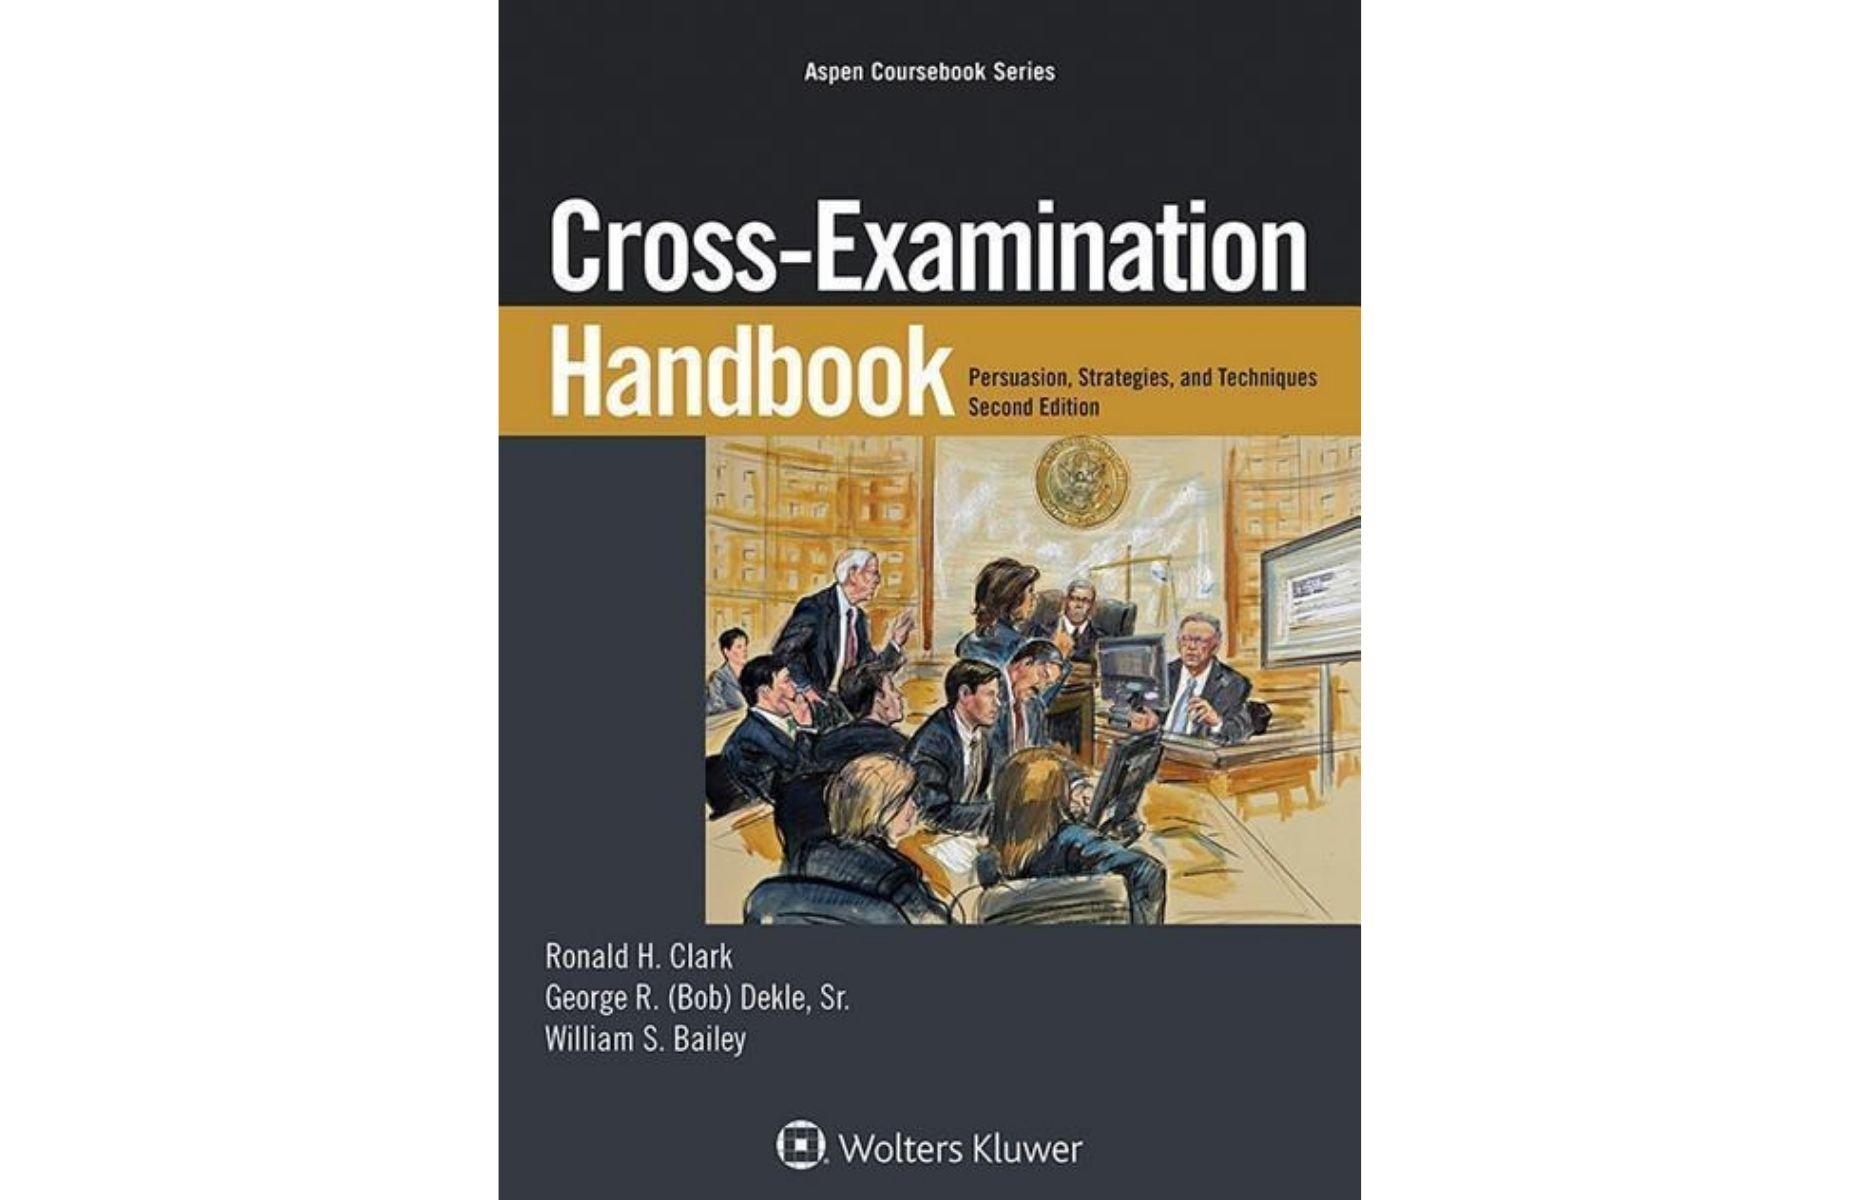 #9 The-cross-examination-handbook